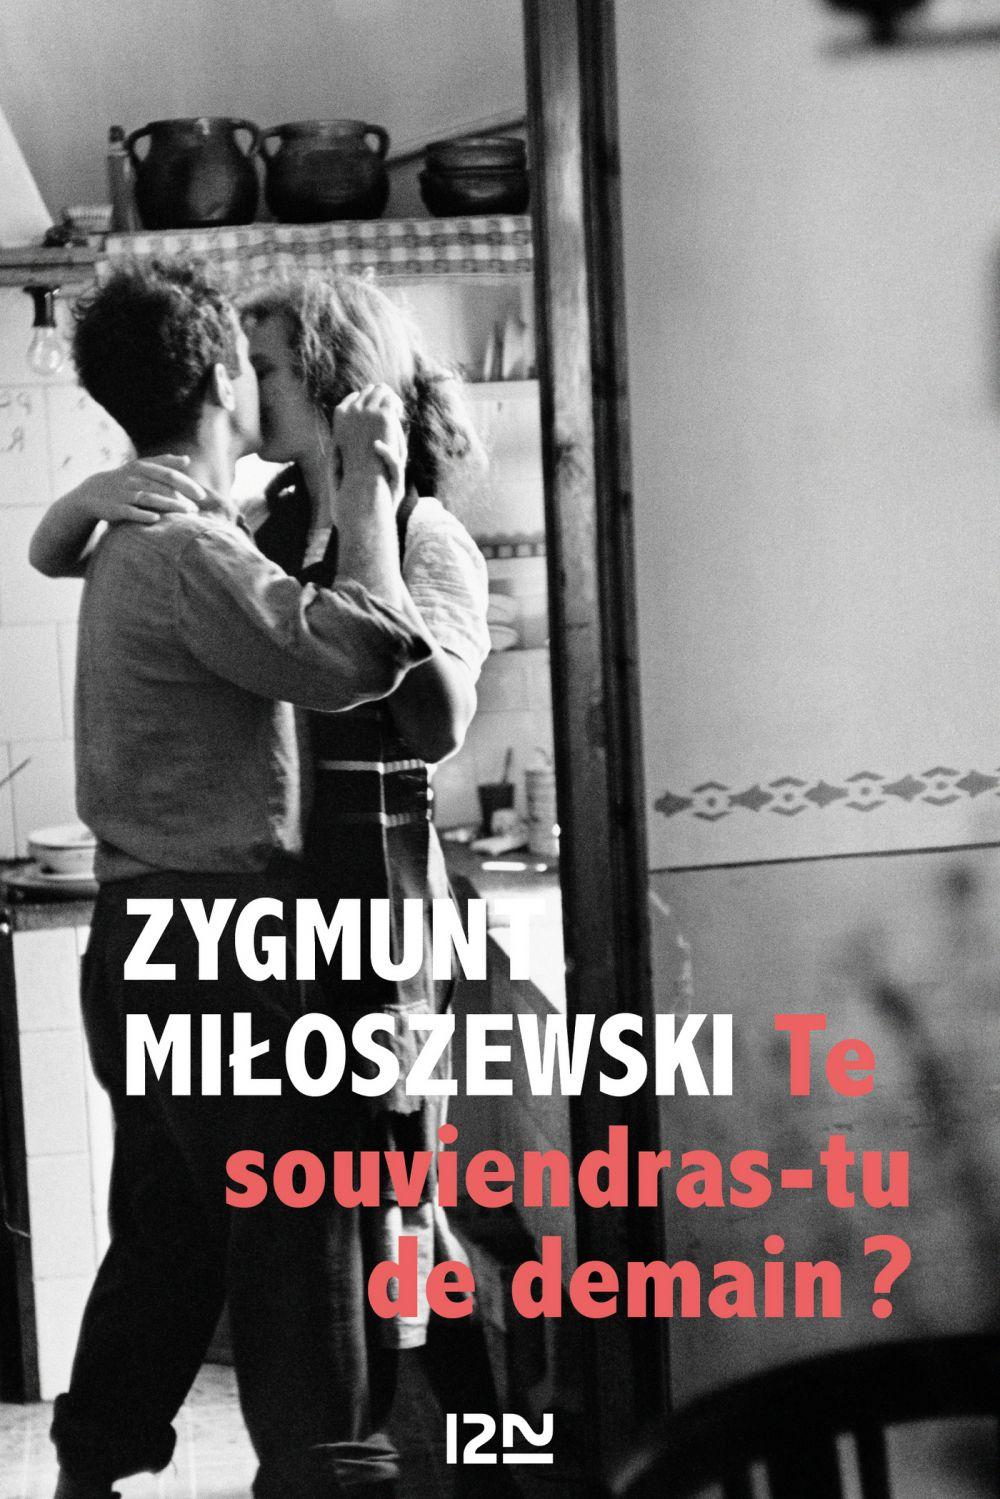 Te souviendras-tu de demain? | Miloszewski, Zygmunt (1976-....). Auteur